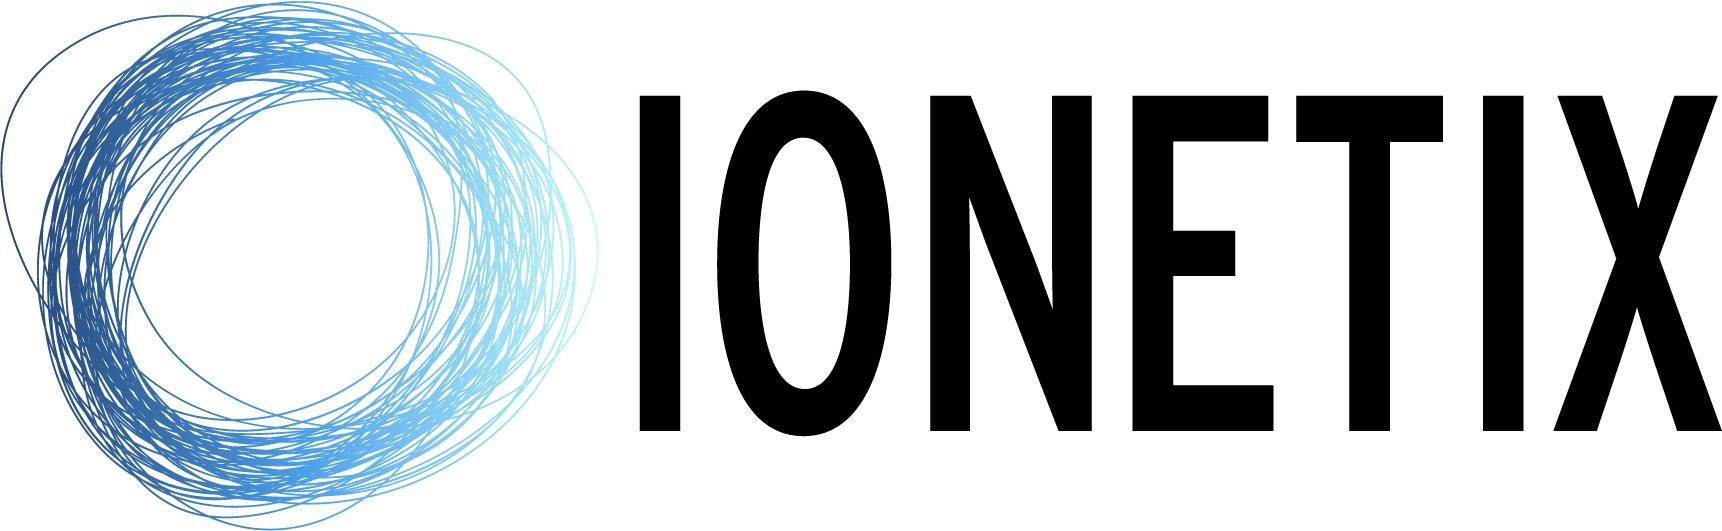 Ionetix Corporation